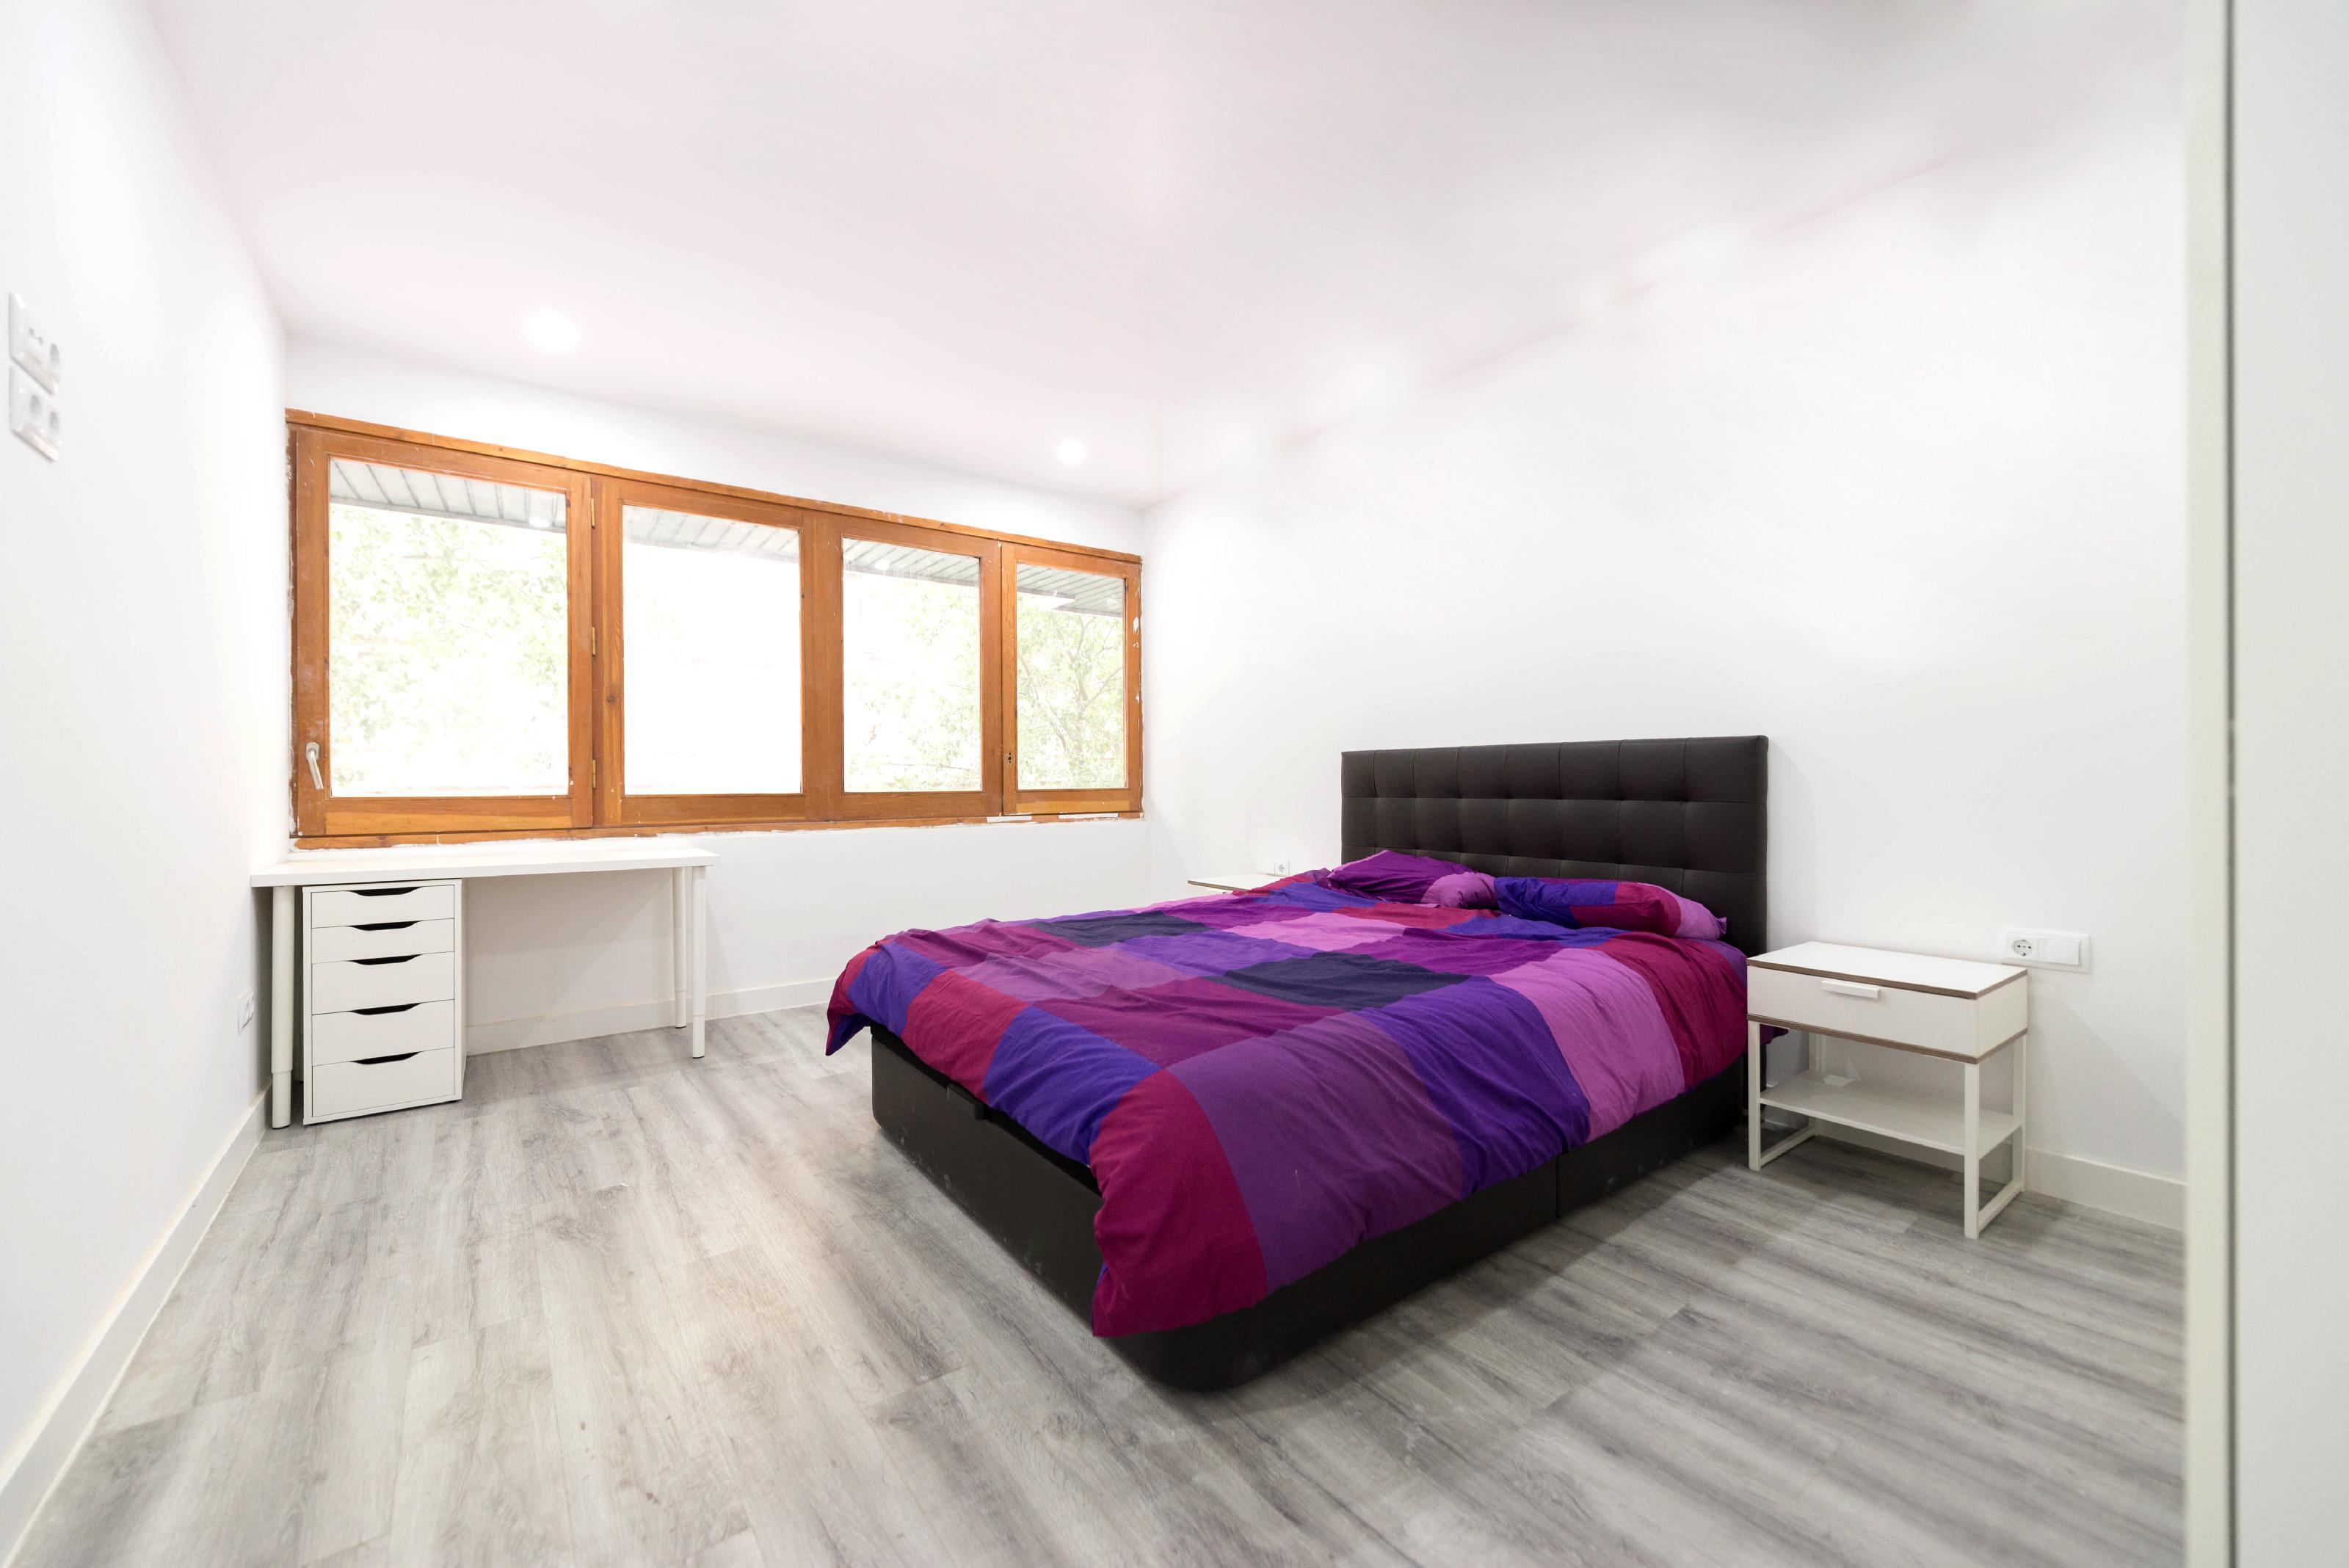 242980 Flat for sale in Eixample, Sagrada Familia 18